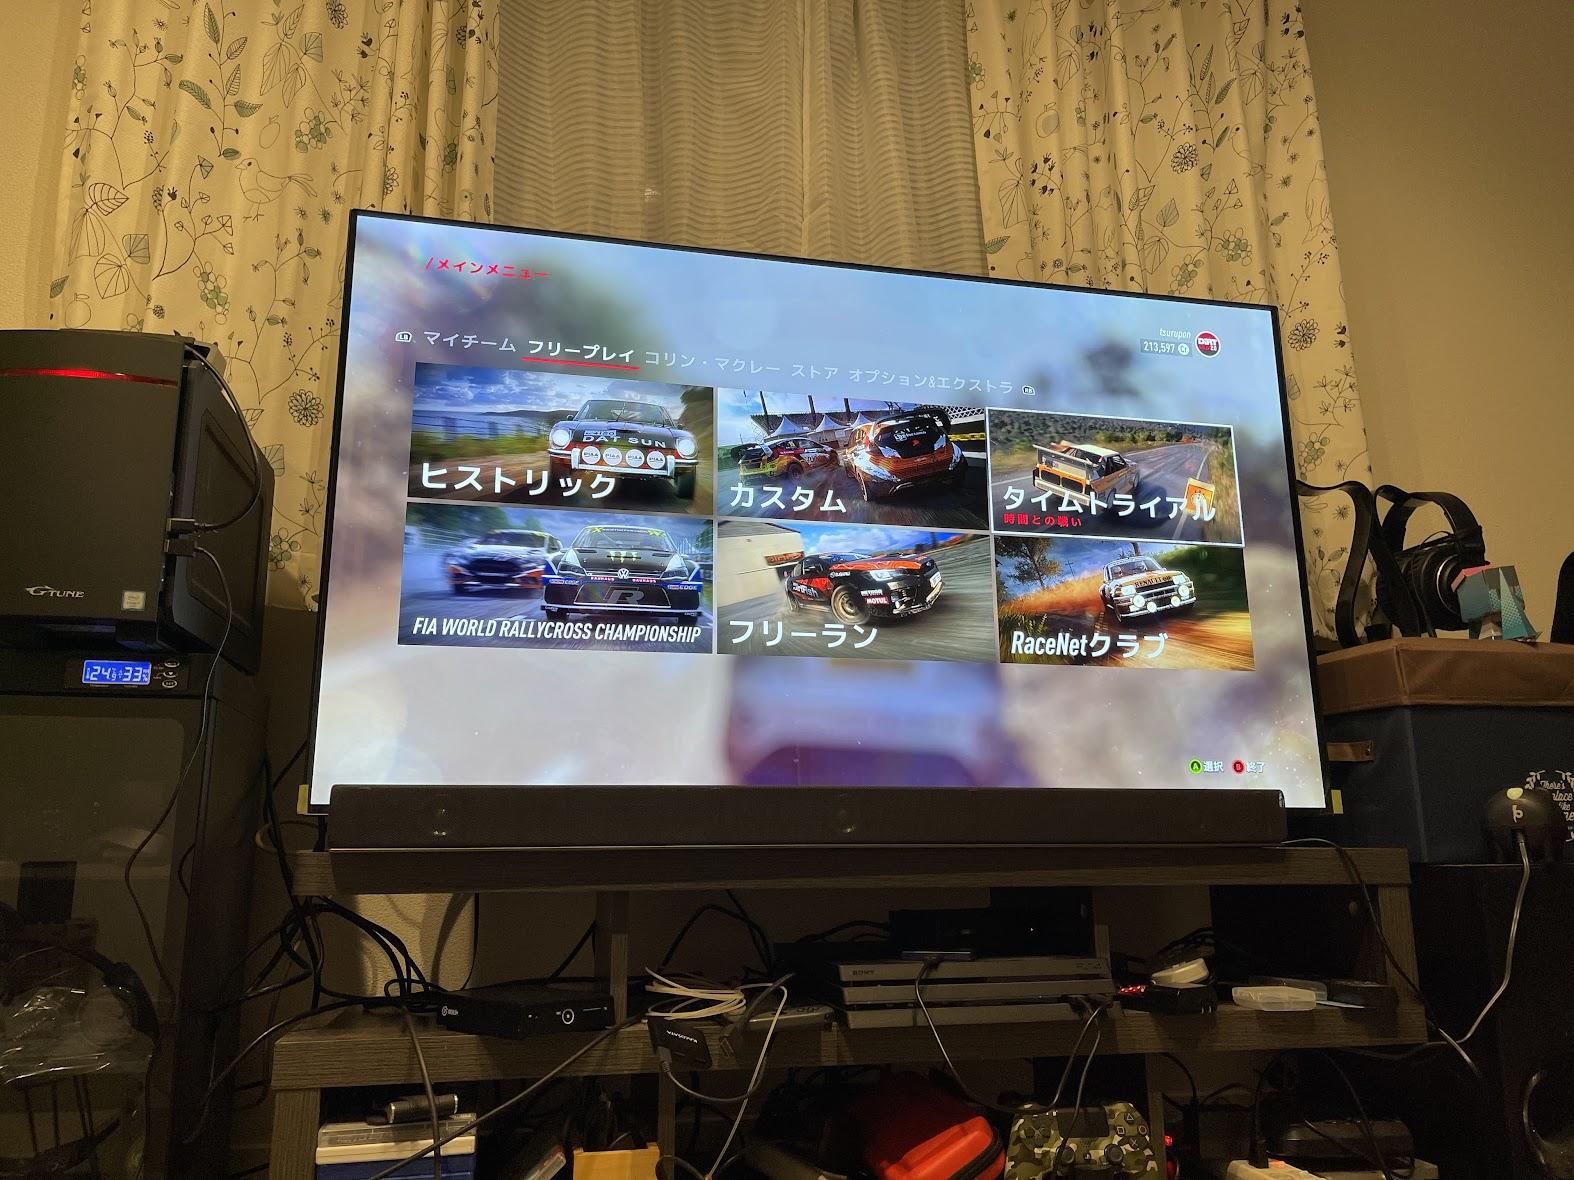 LG 55型 有機ELテレビ OLED 55CXPJA を買ったよ